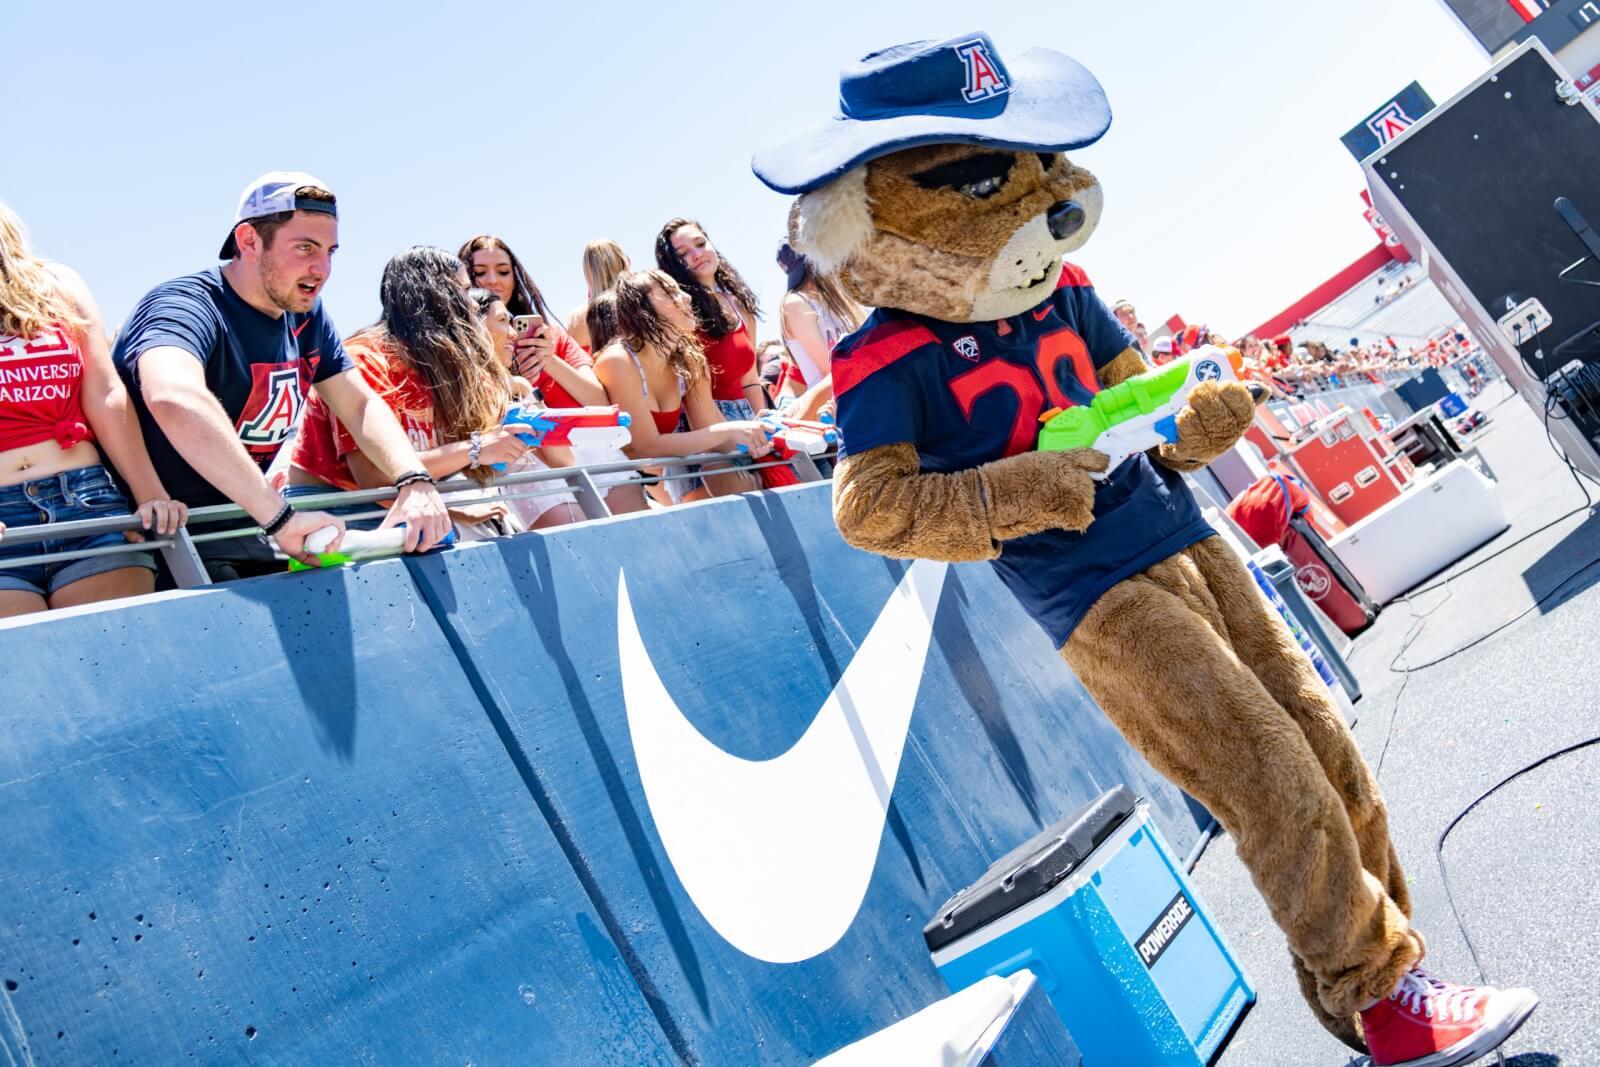 University of Arizona Mascot, Wilbur, shoots a large water gun while a crowd of U of A students mingle behind him.